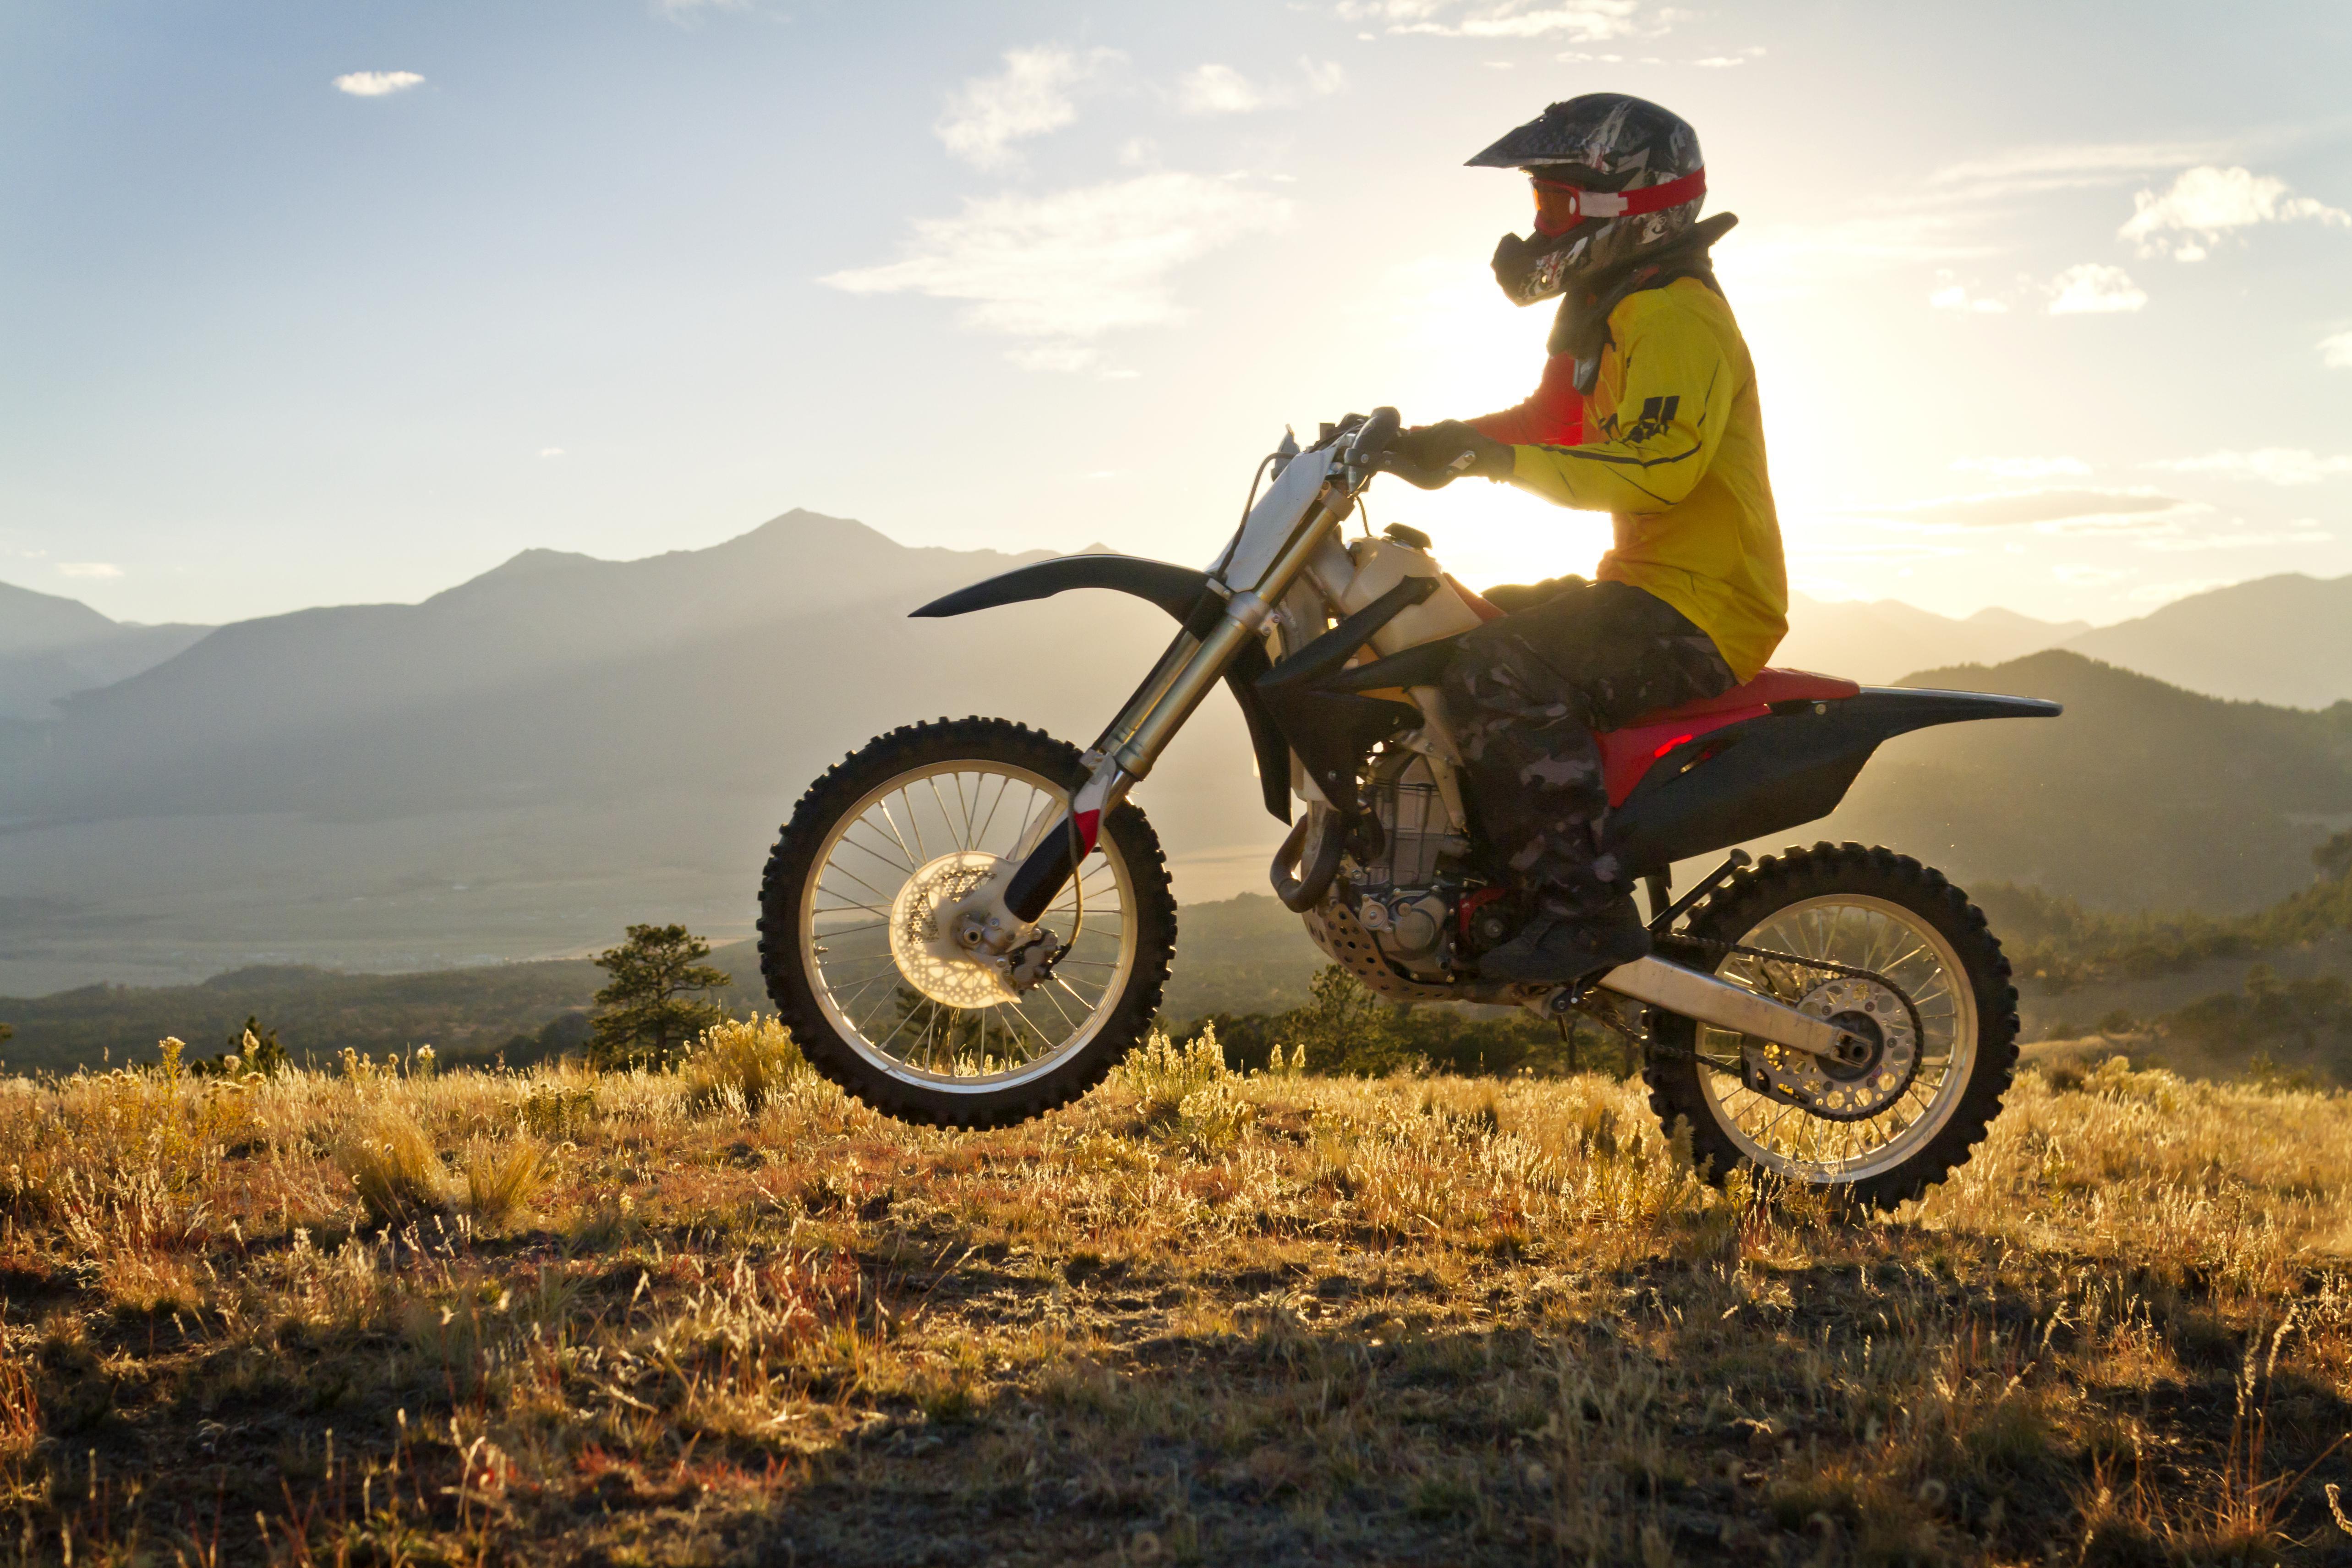 Man Riding Dirt Bike On Mountain